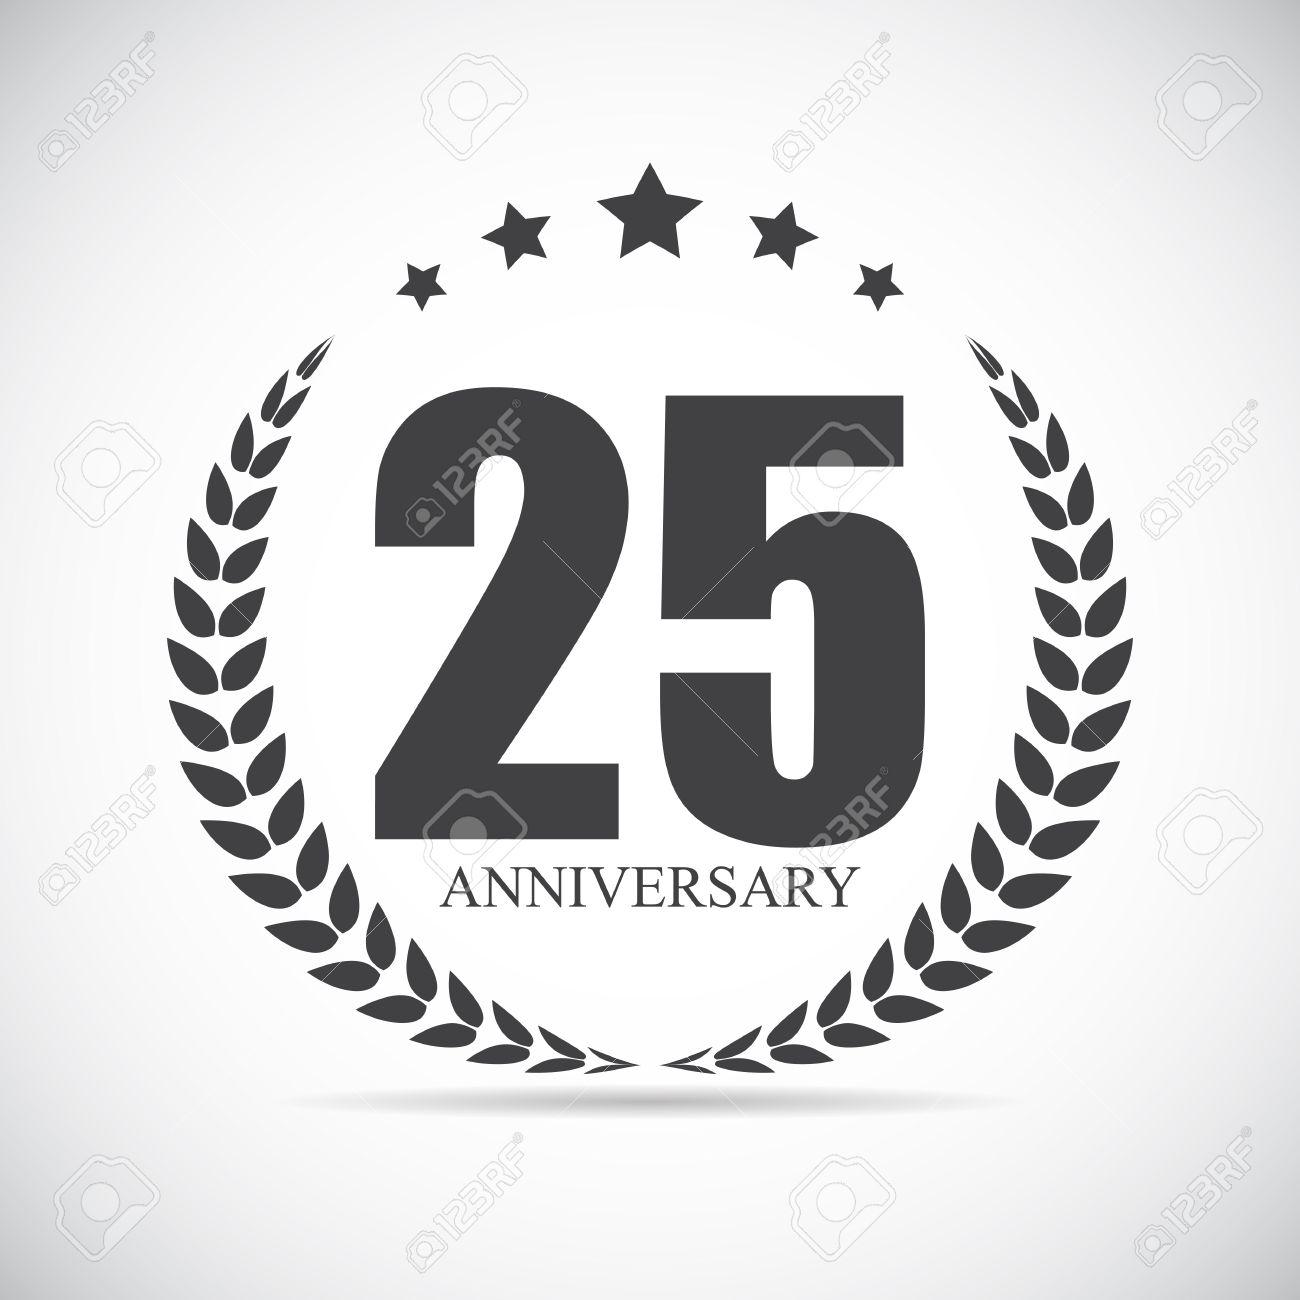 template logo 25 years anniversary vector illustration eps10 royalty